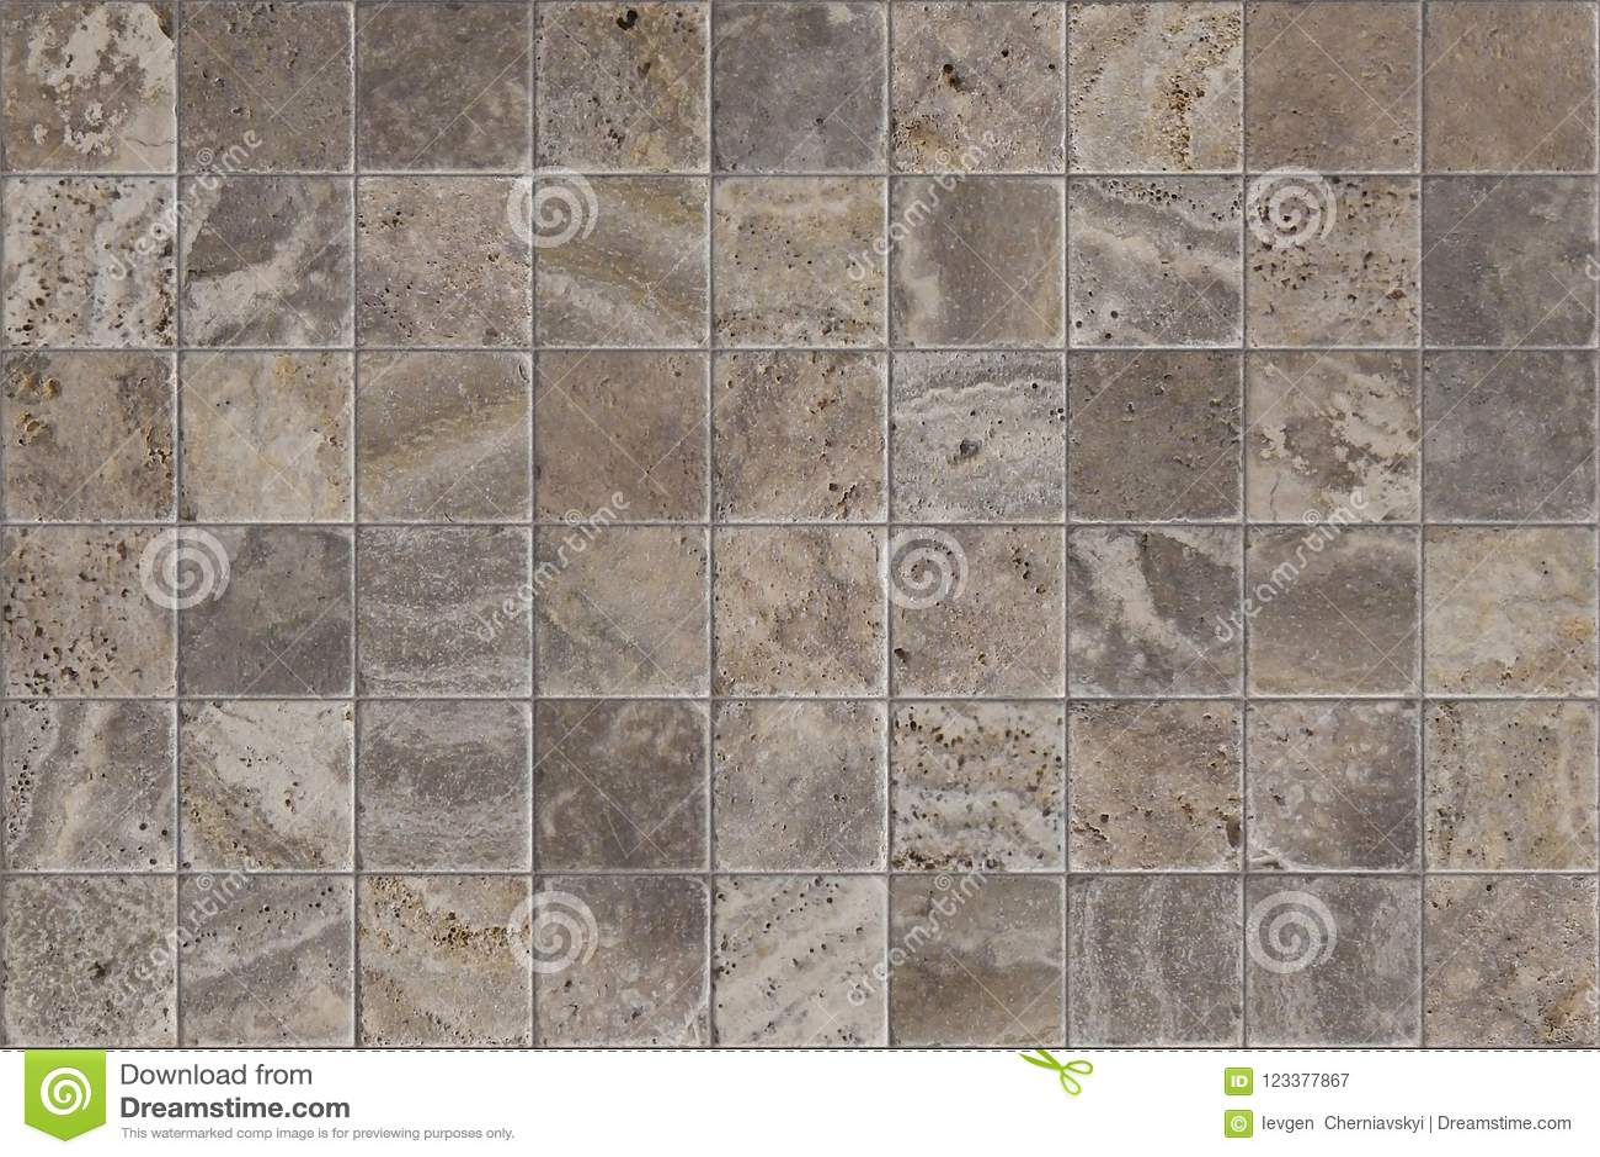 Travertine Tile Ceramic Mosaic Square Design Seamless Texture